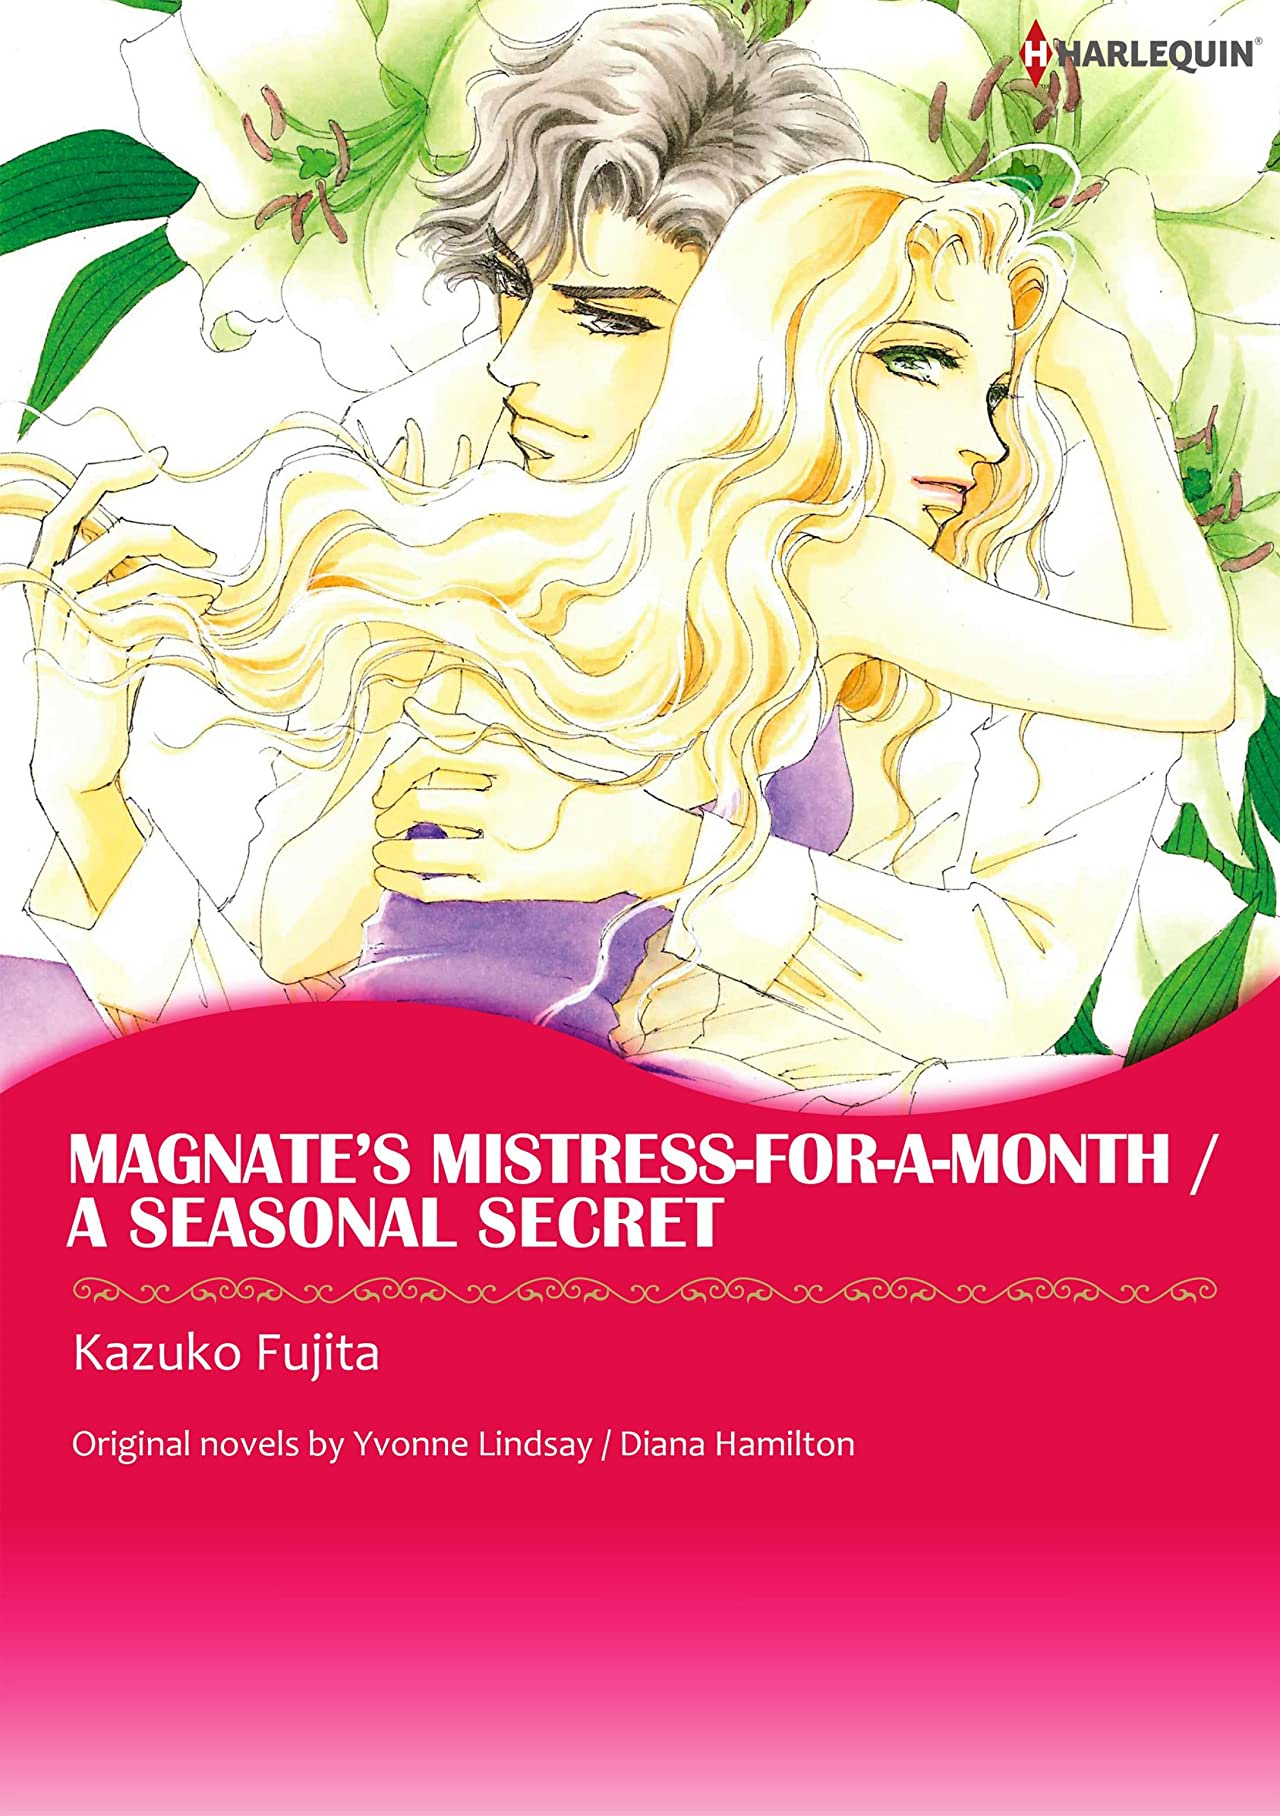 Magnate's Mistress-For-A-Month/A Seasonal Secret